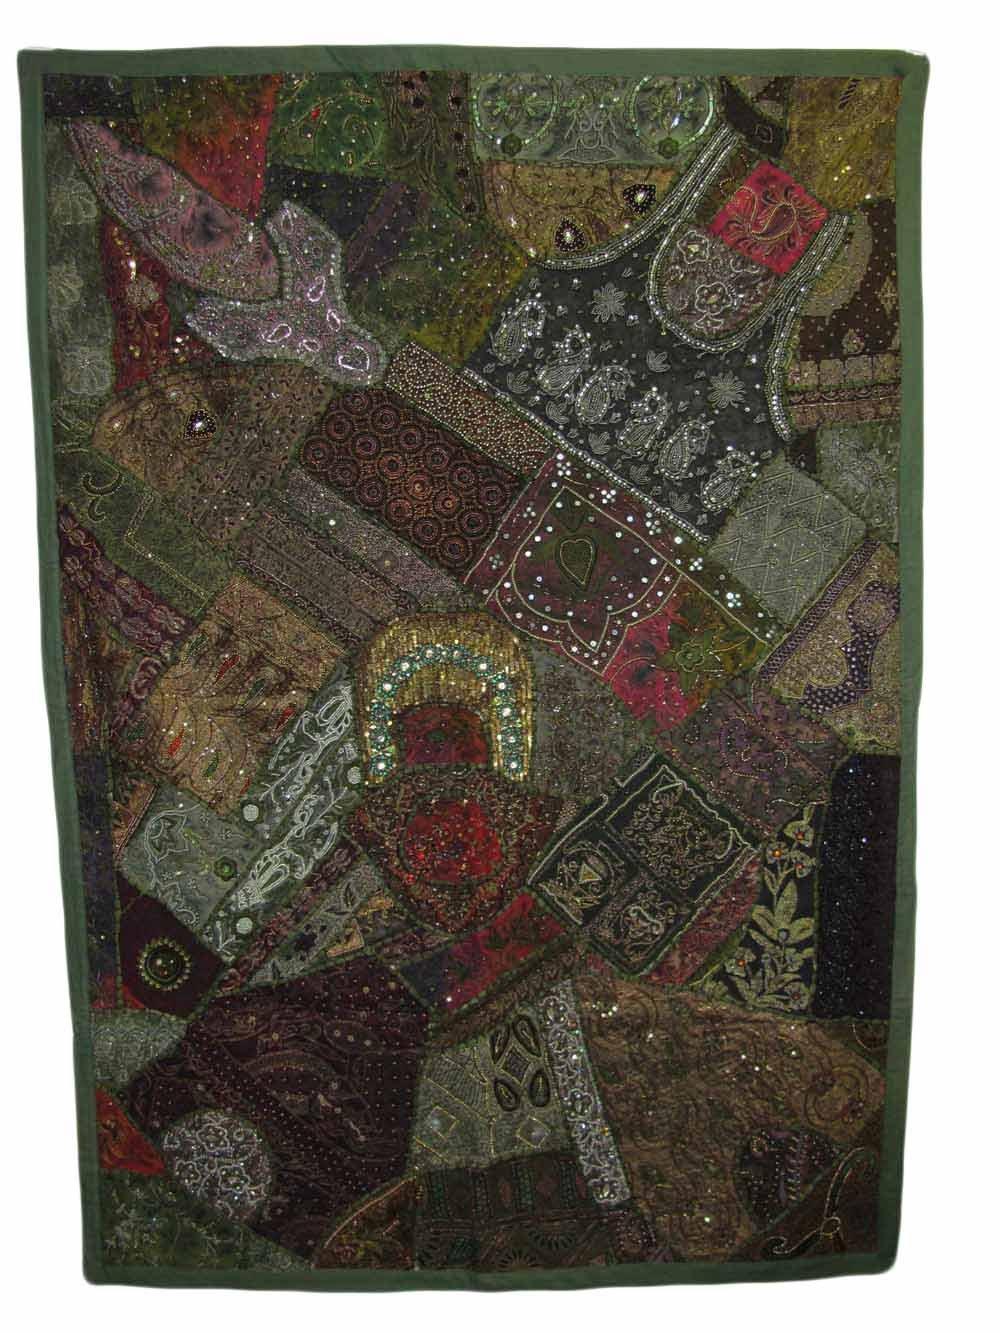 Indian Kantha Zari Handmade Vintage Tribal Rajasthani Patchwork Royal Wall Hanging Art Beaded Tapestry (Green and Brown Tones)